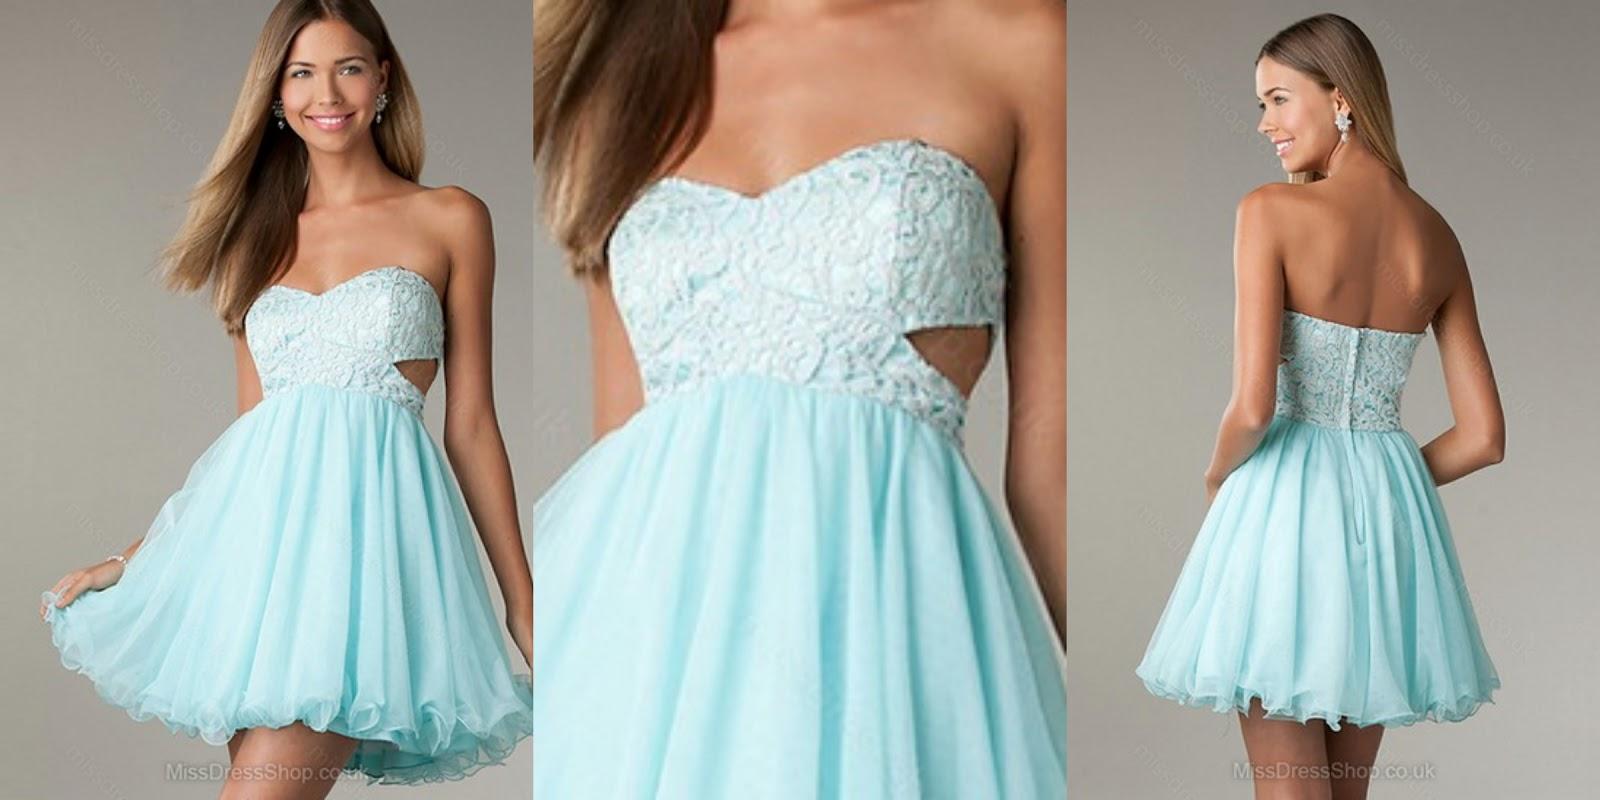 Cutest Prom Dresses Under 100